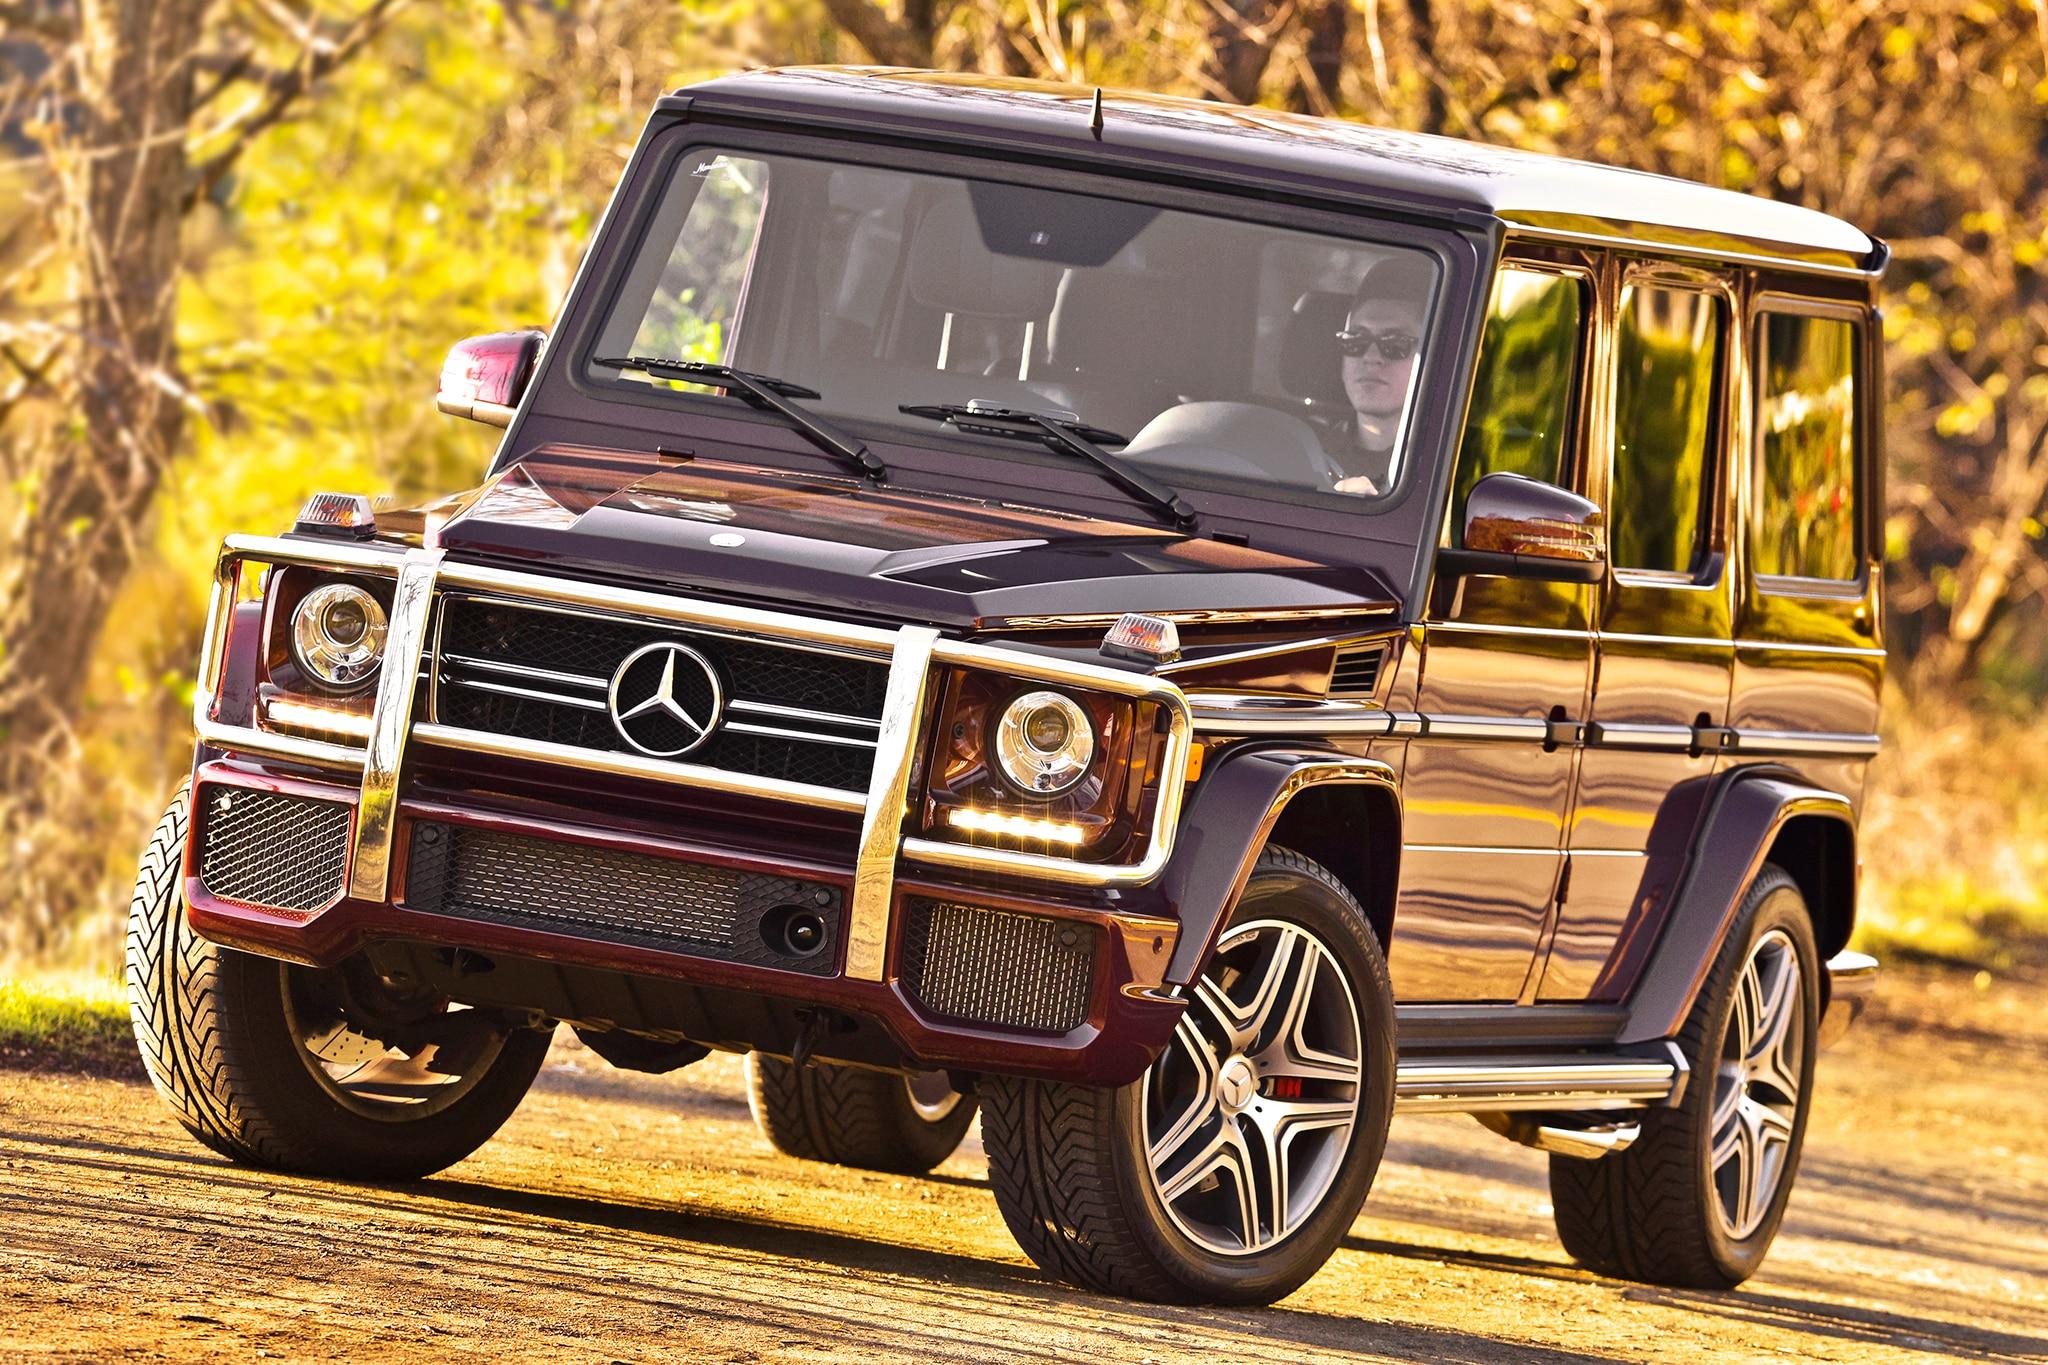 Mansory Modifies Mercedes-Benz G63 AMG 6x6 - Automobile ...